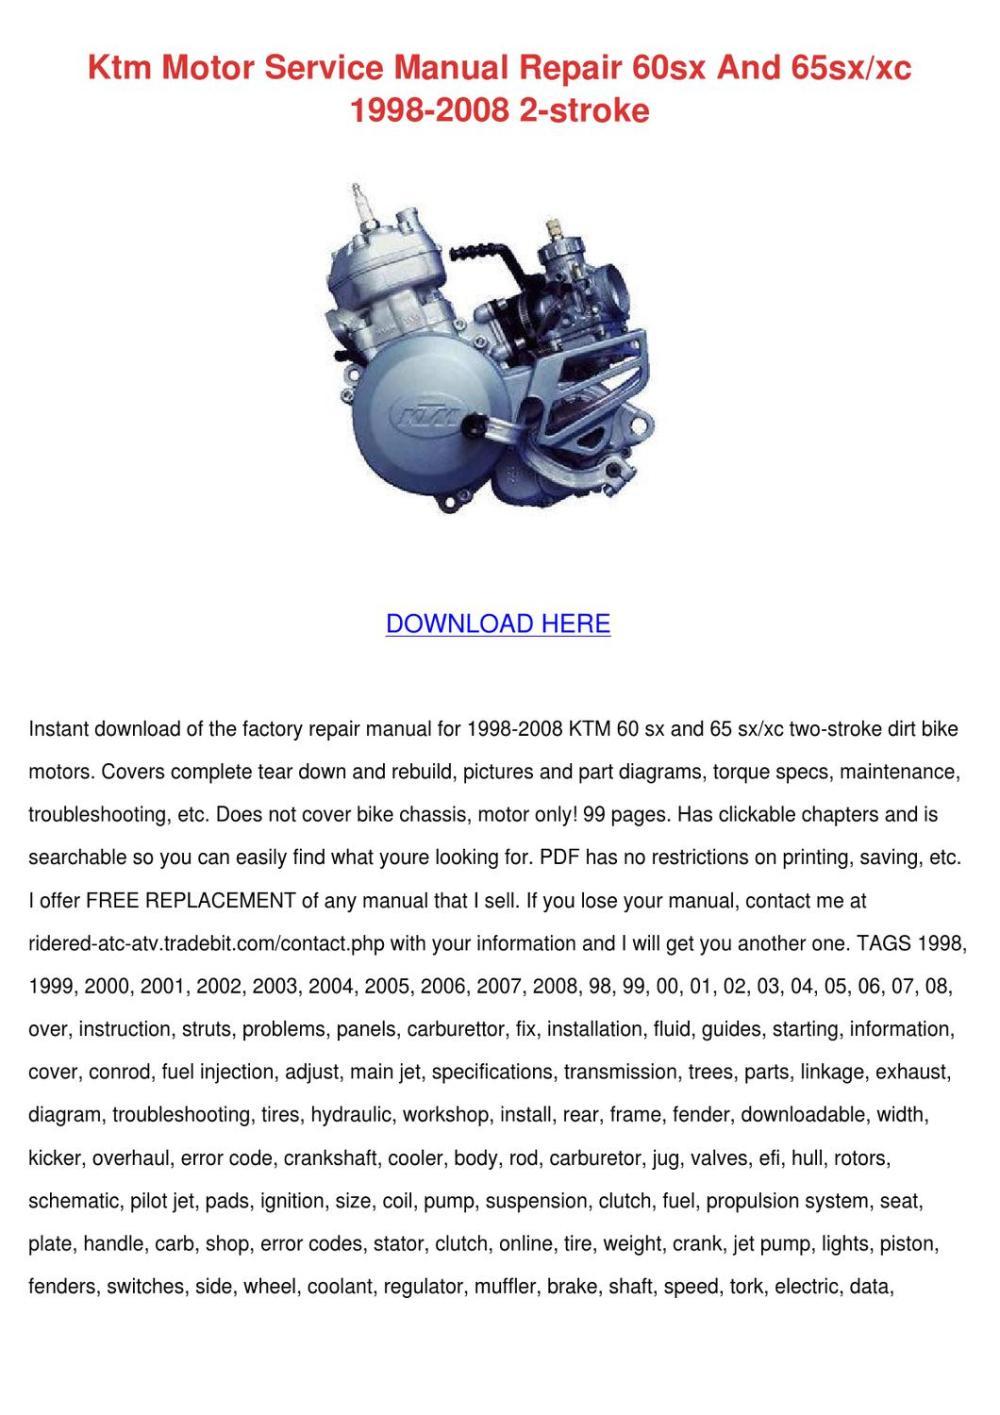 medium resolution of ktm 60sx 65sx 85sx bike engine workshop repair manual service manual ktm 65sx ktm service repair manual download pdf tradebit